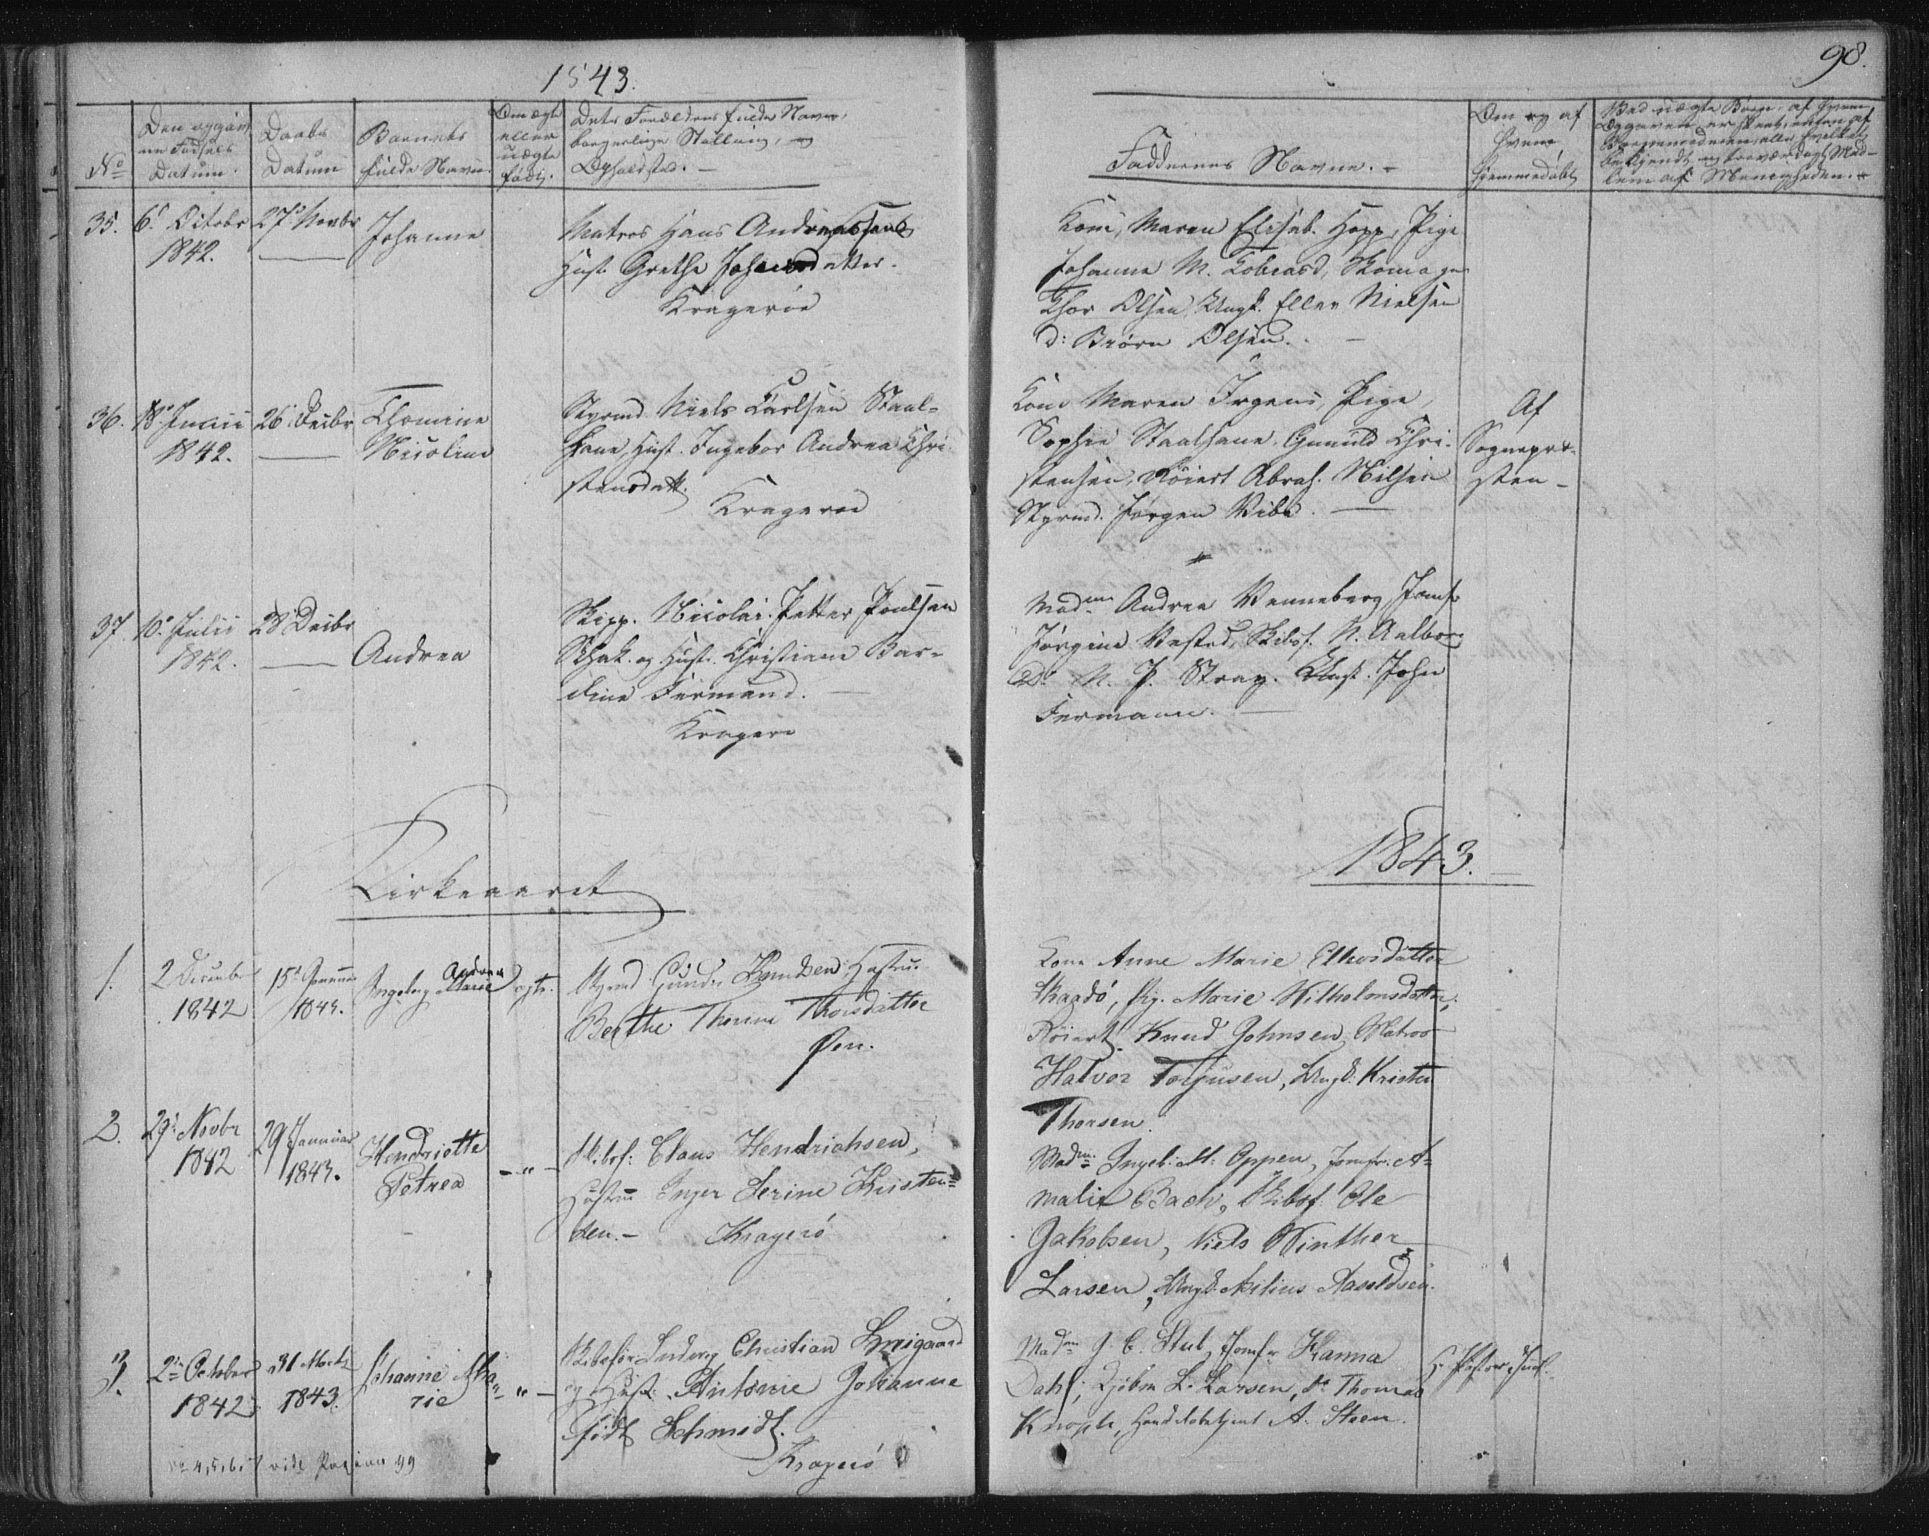 SAKO, Kragerø kirkebøker, F/Fa/L0005: Ministerialbok nr. 5, 1832-1847, s. 98